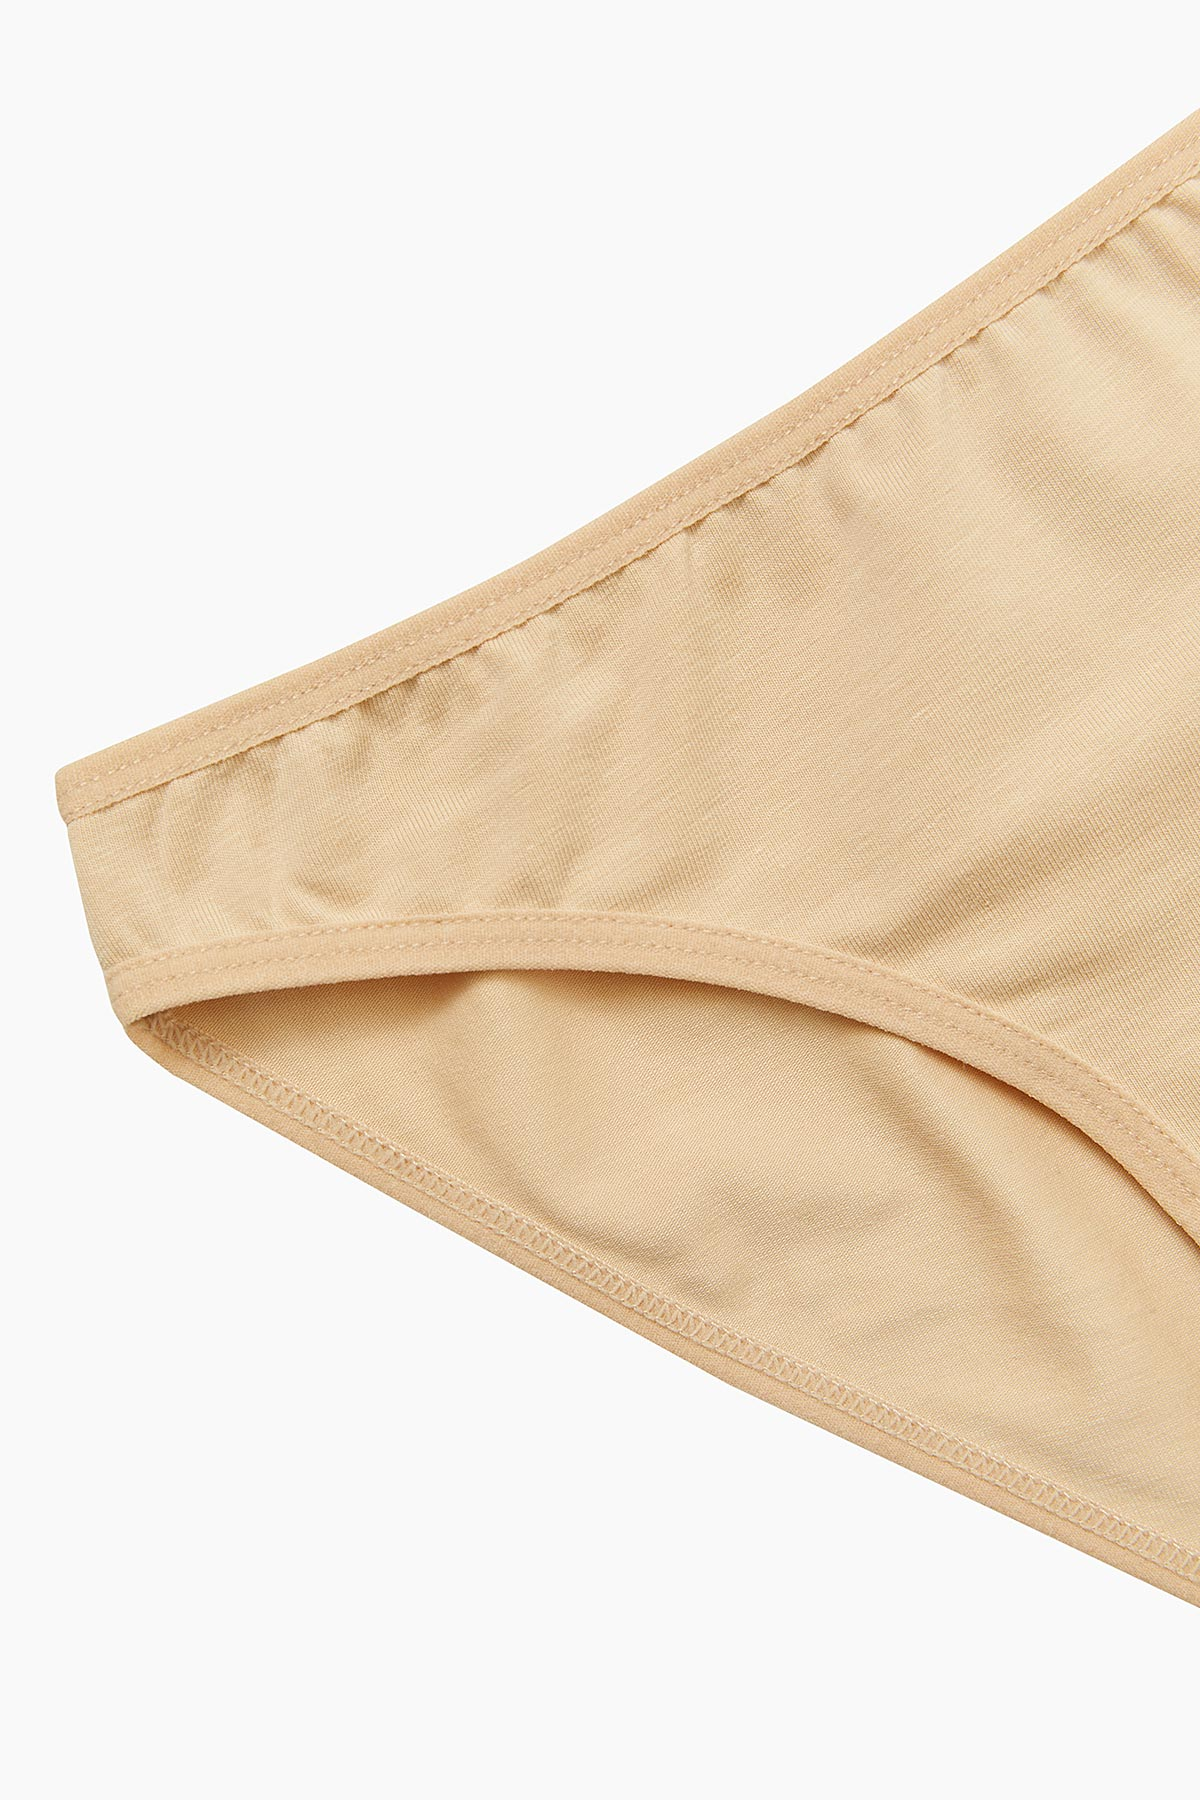 Bross 1220 2-Pack Elastane Women's Panties